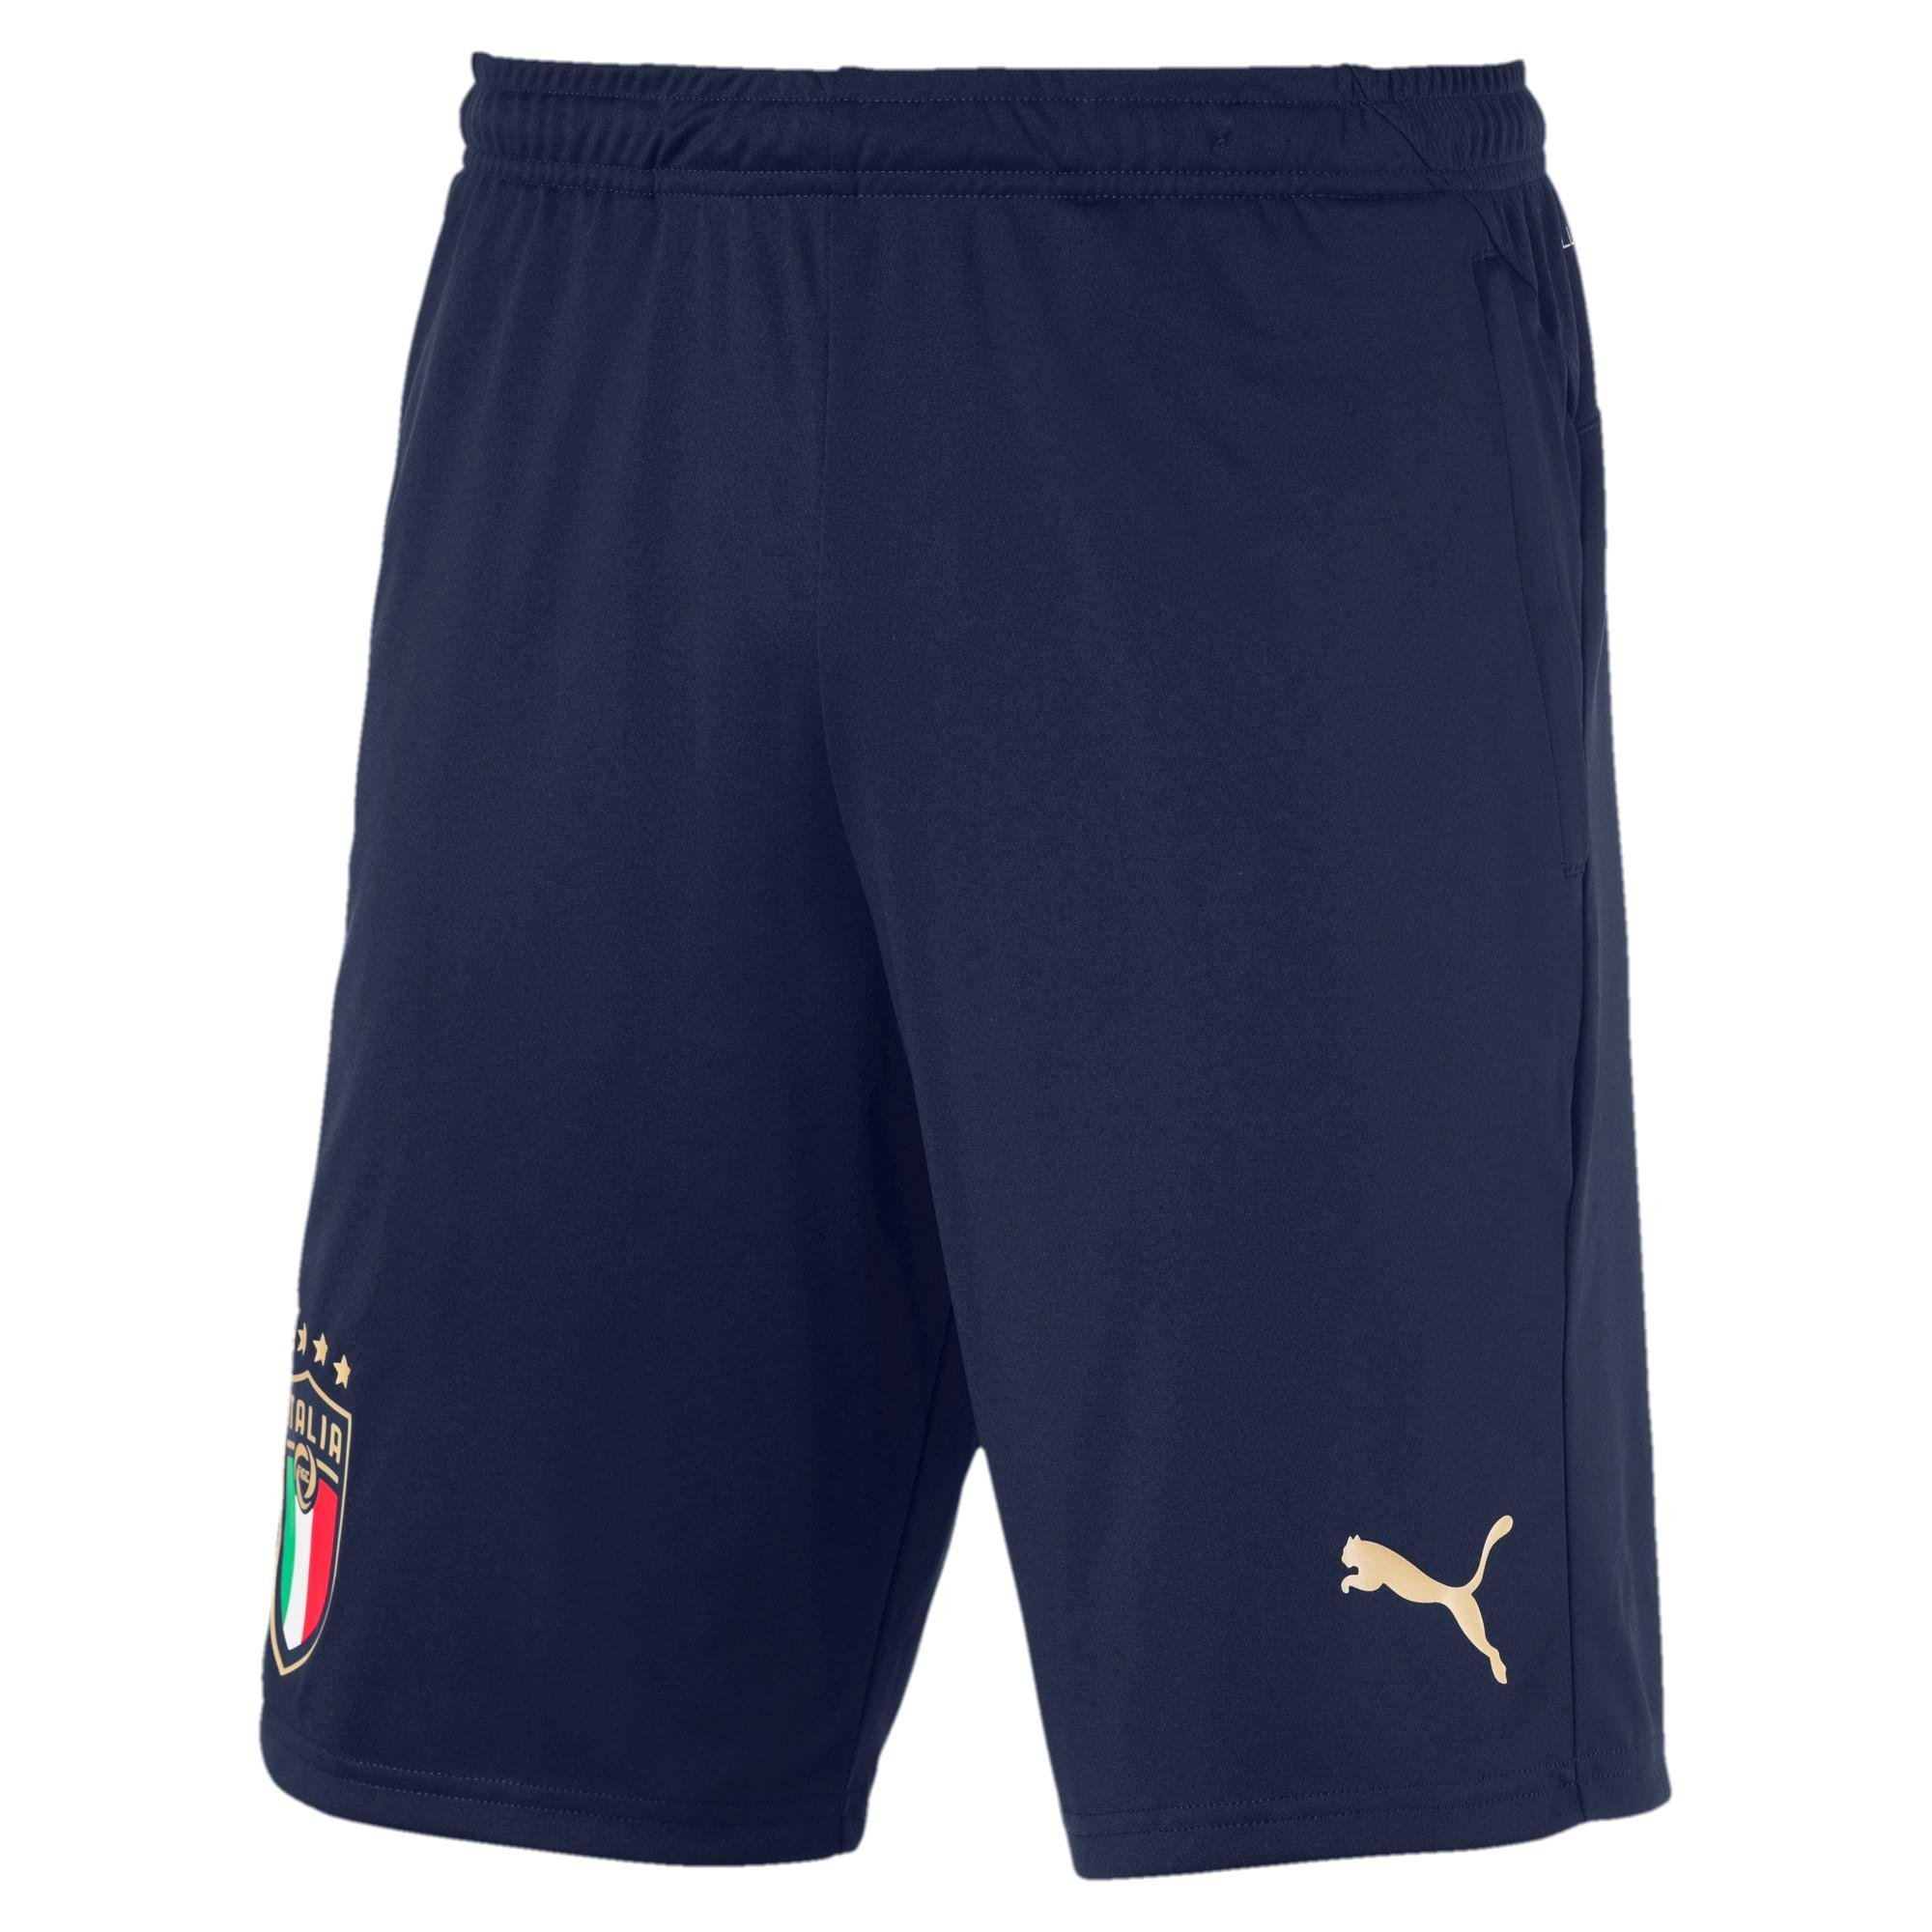 Puma Short Pants Training Italy